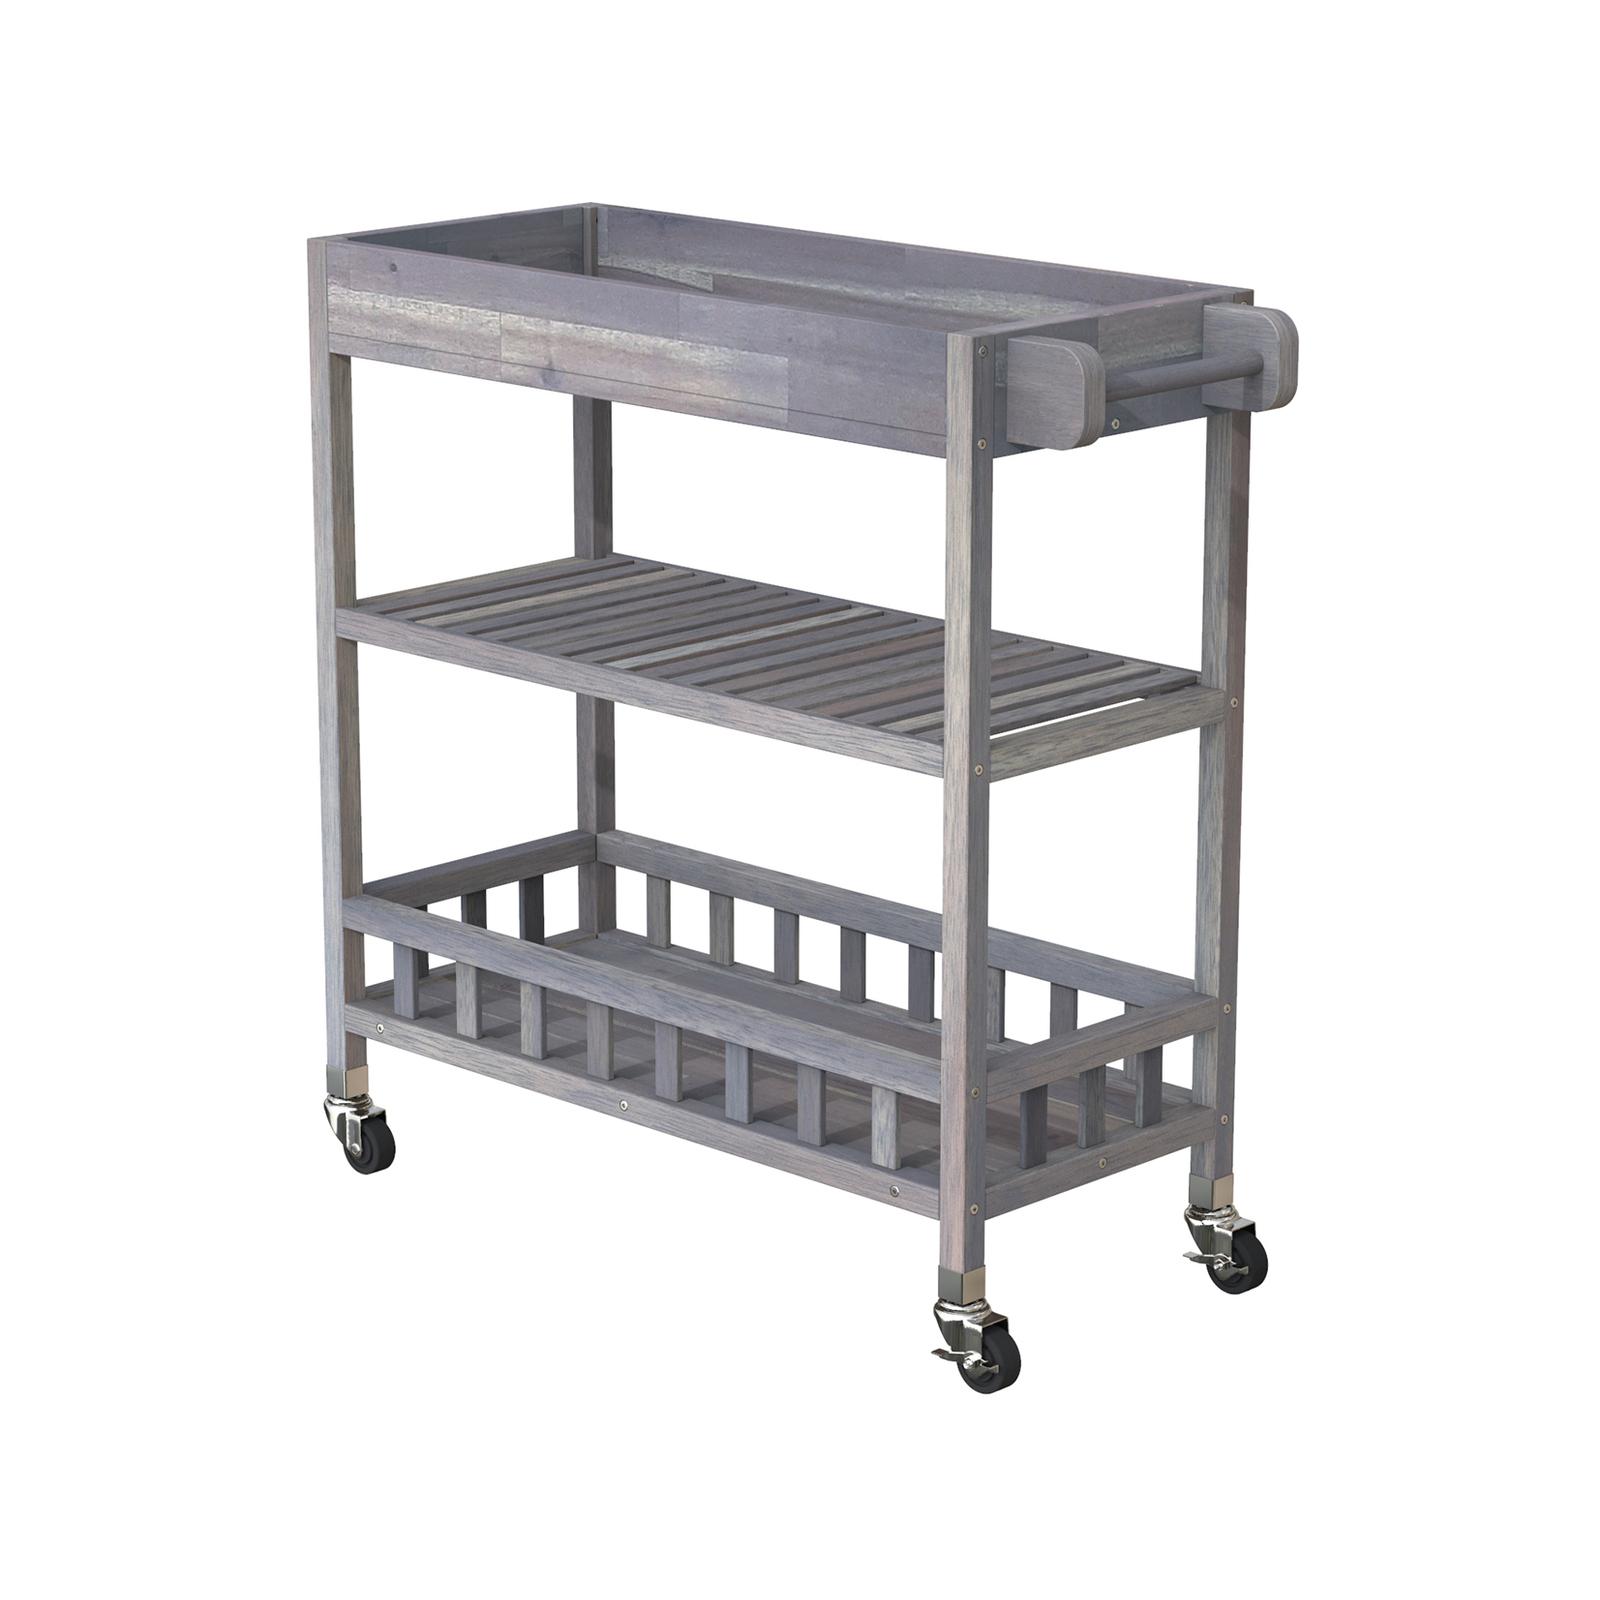 Interbuild 80 x 35 x 85cm Dusk Grey Holger SUV Kitchen Cart